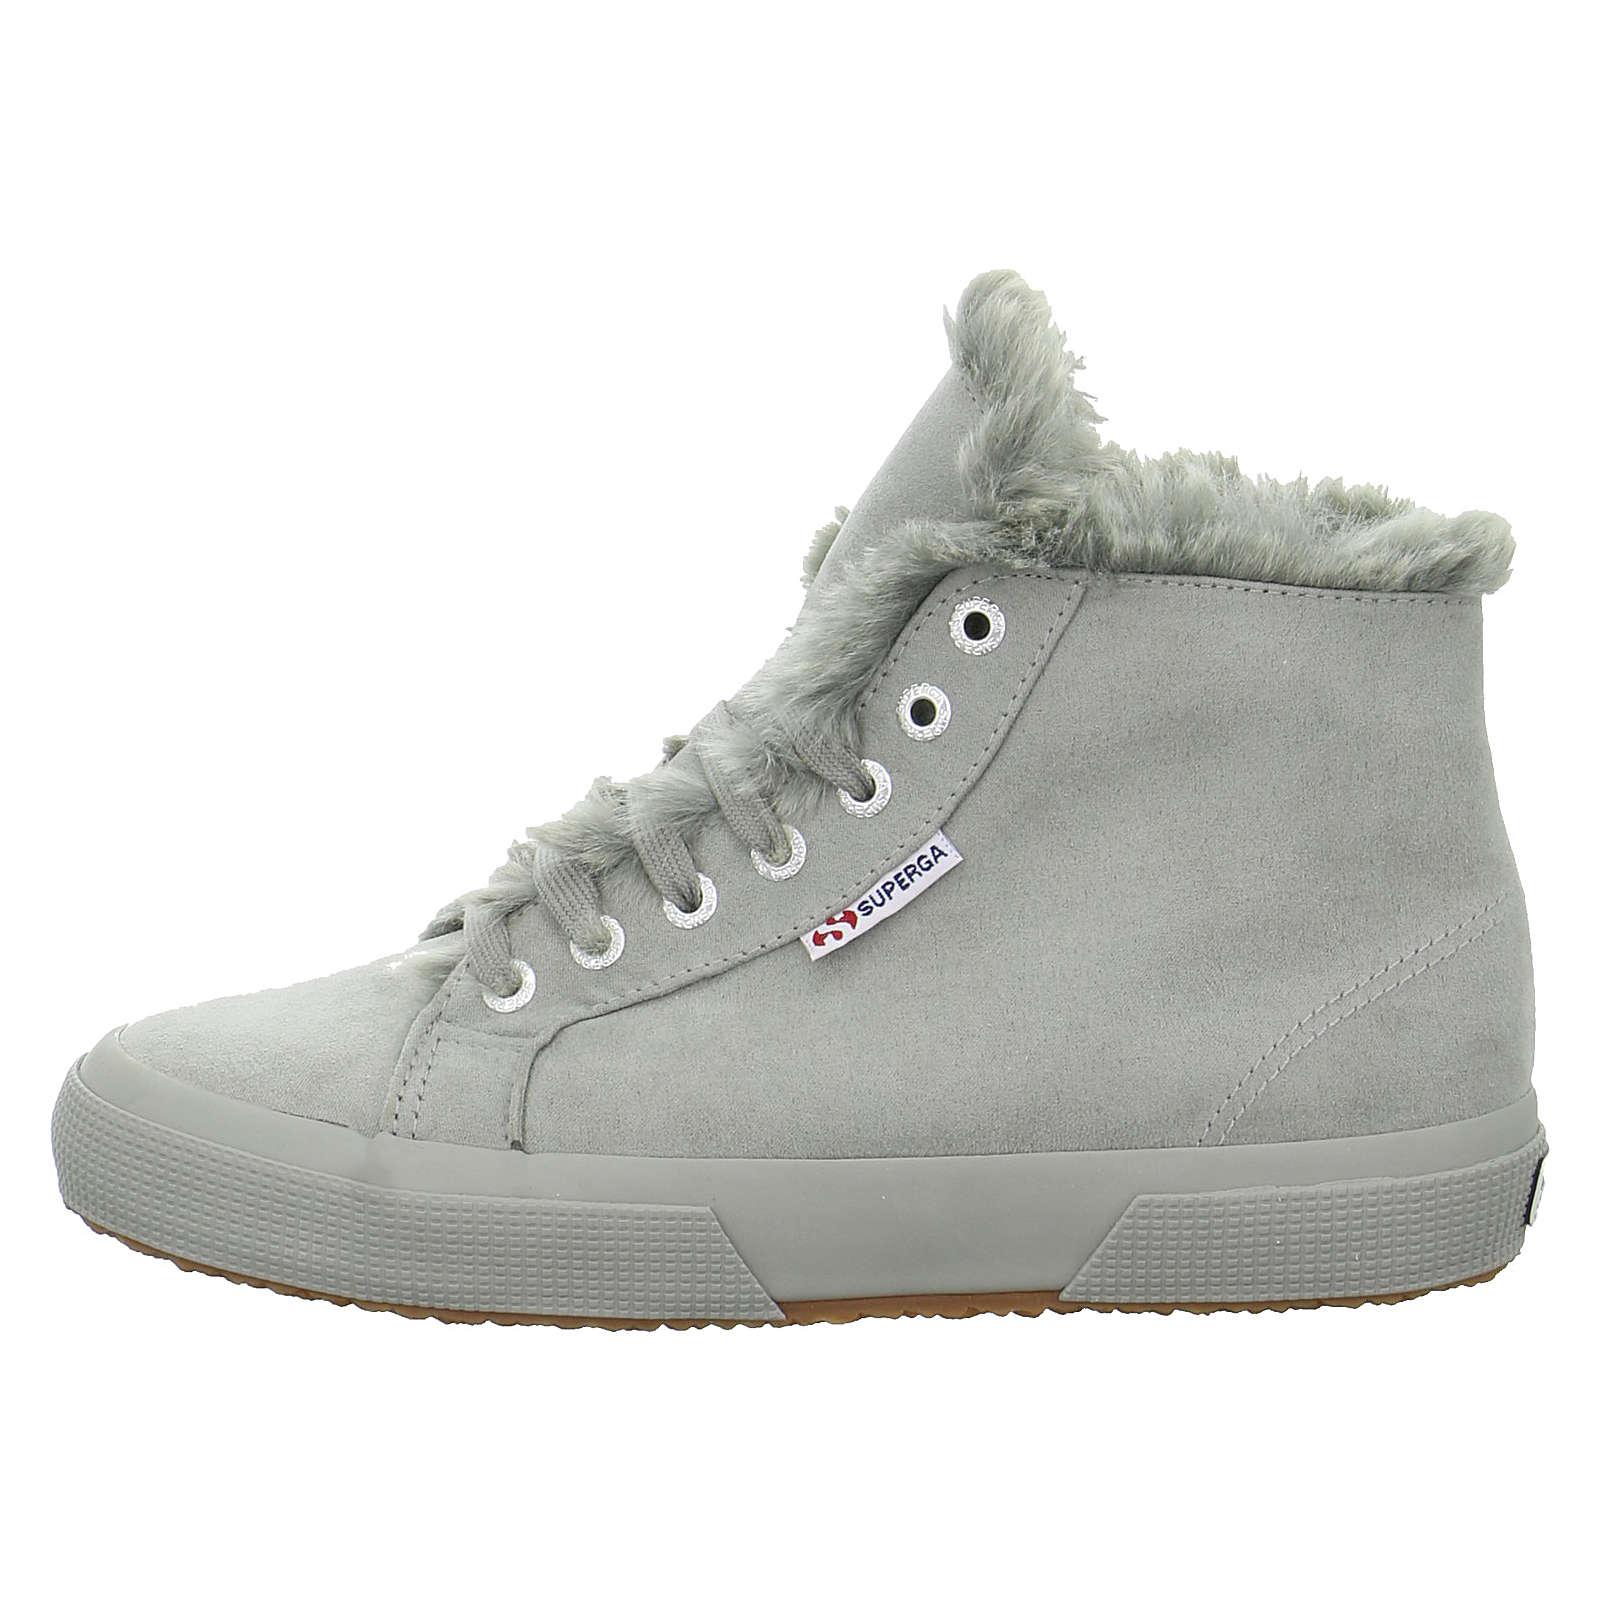 Superga® Sneakers High 2795 grau Damen Gr. 39